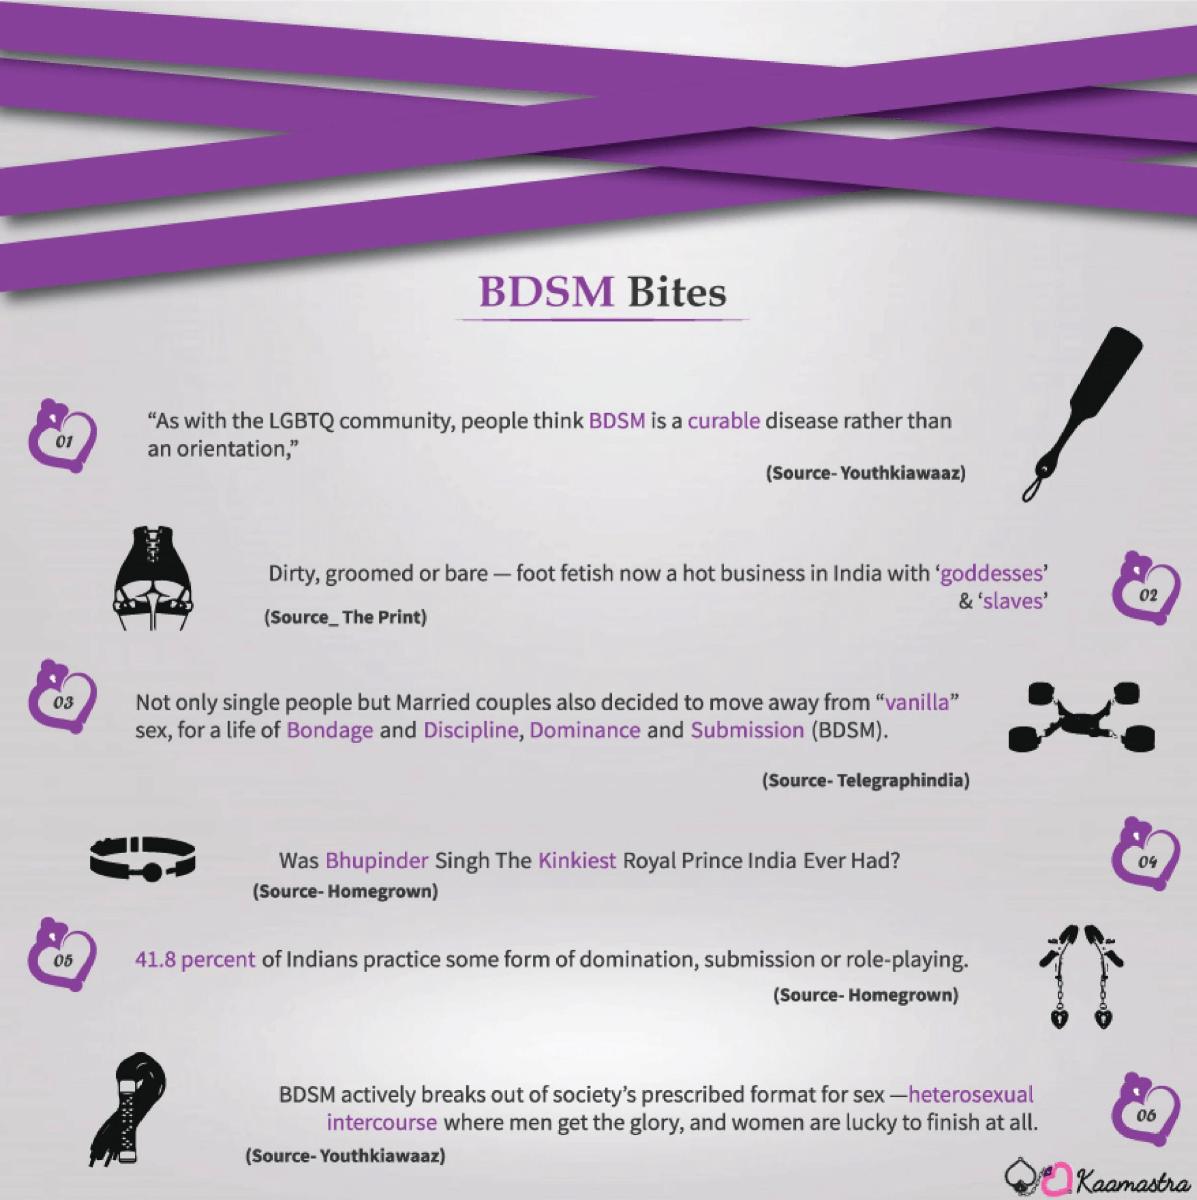 BDSM Bites